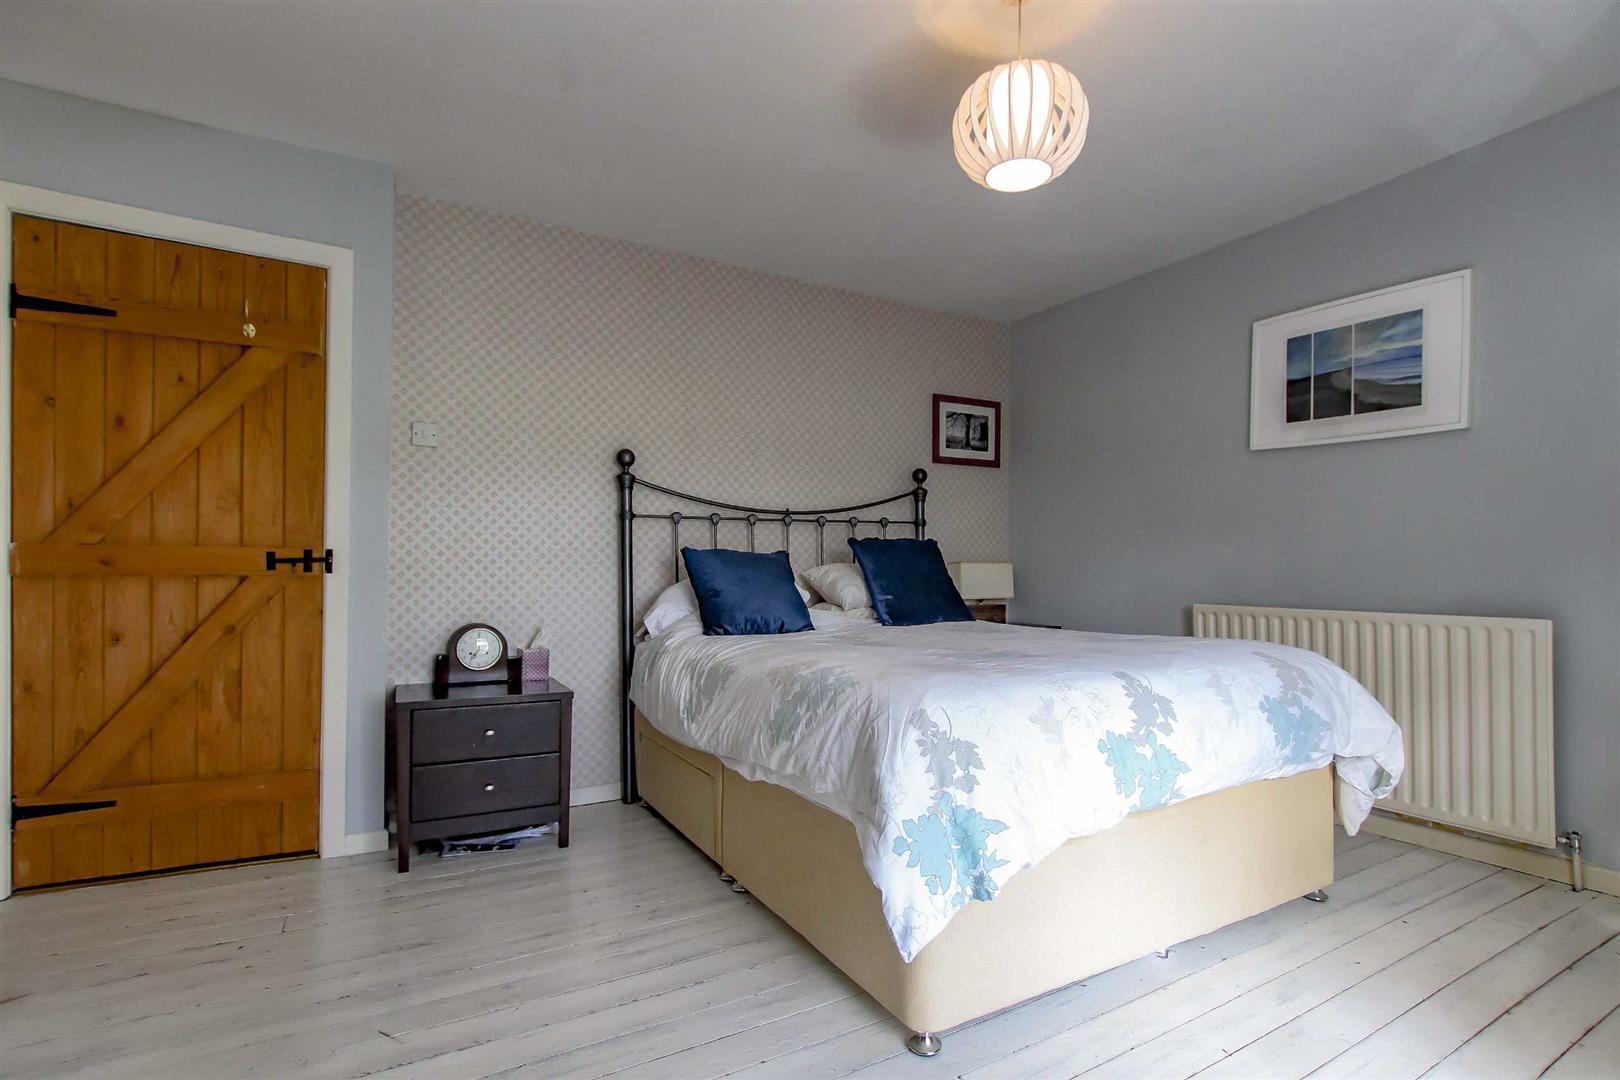 4 Bedroom Detached House For Sale - p033686_37.jpg